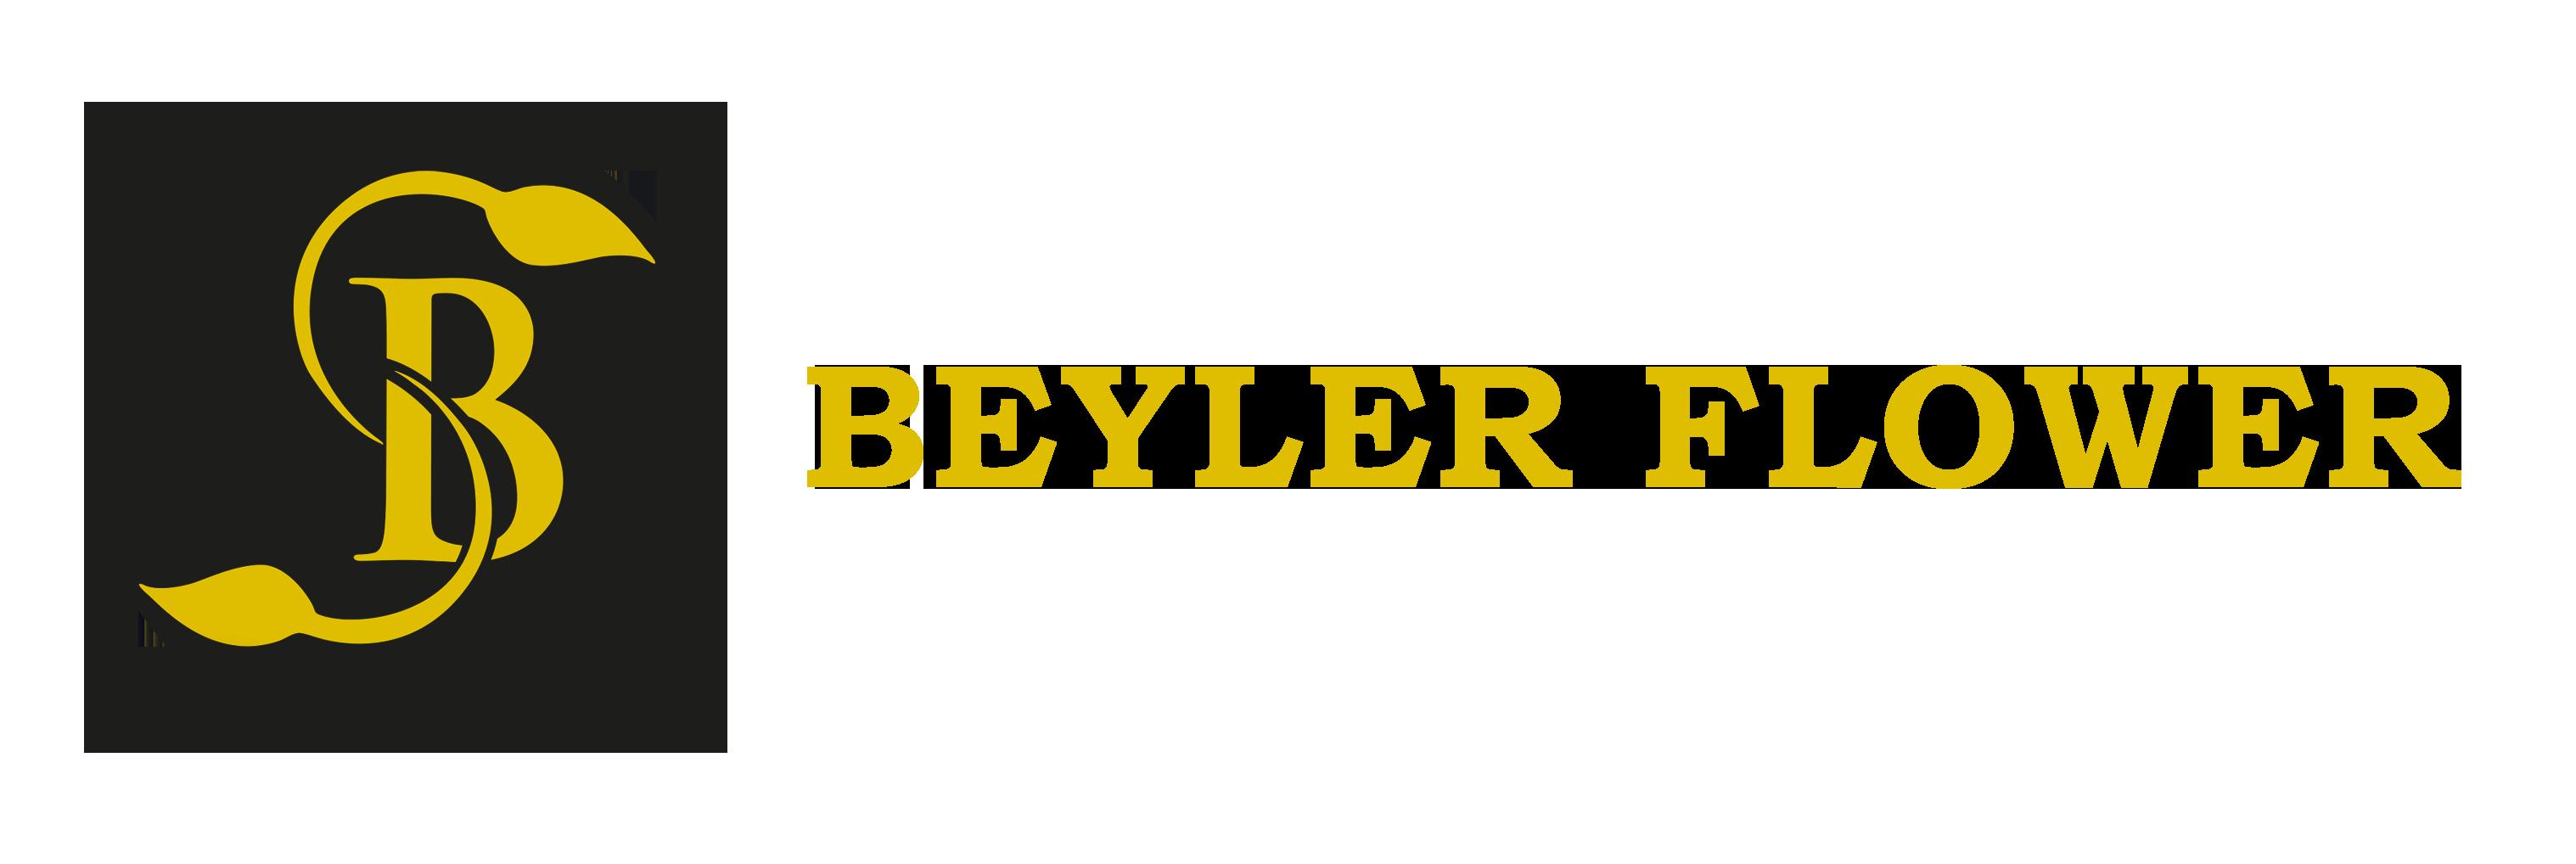 Beyler Flower